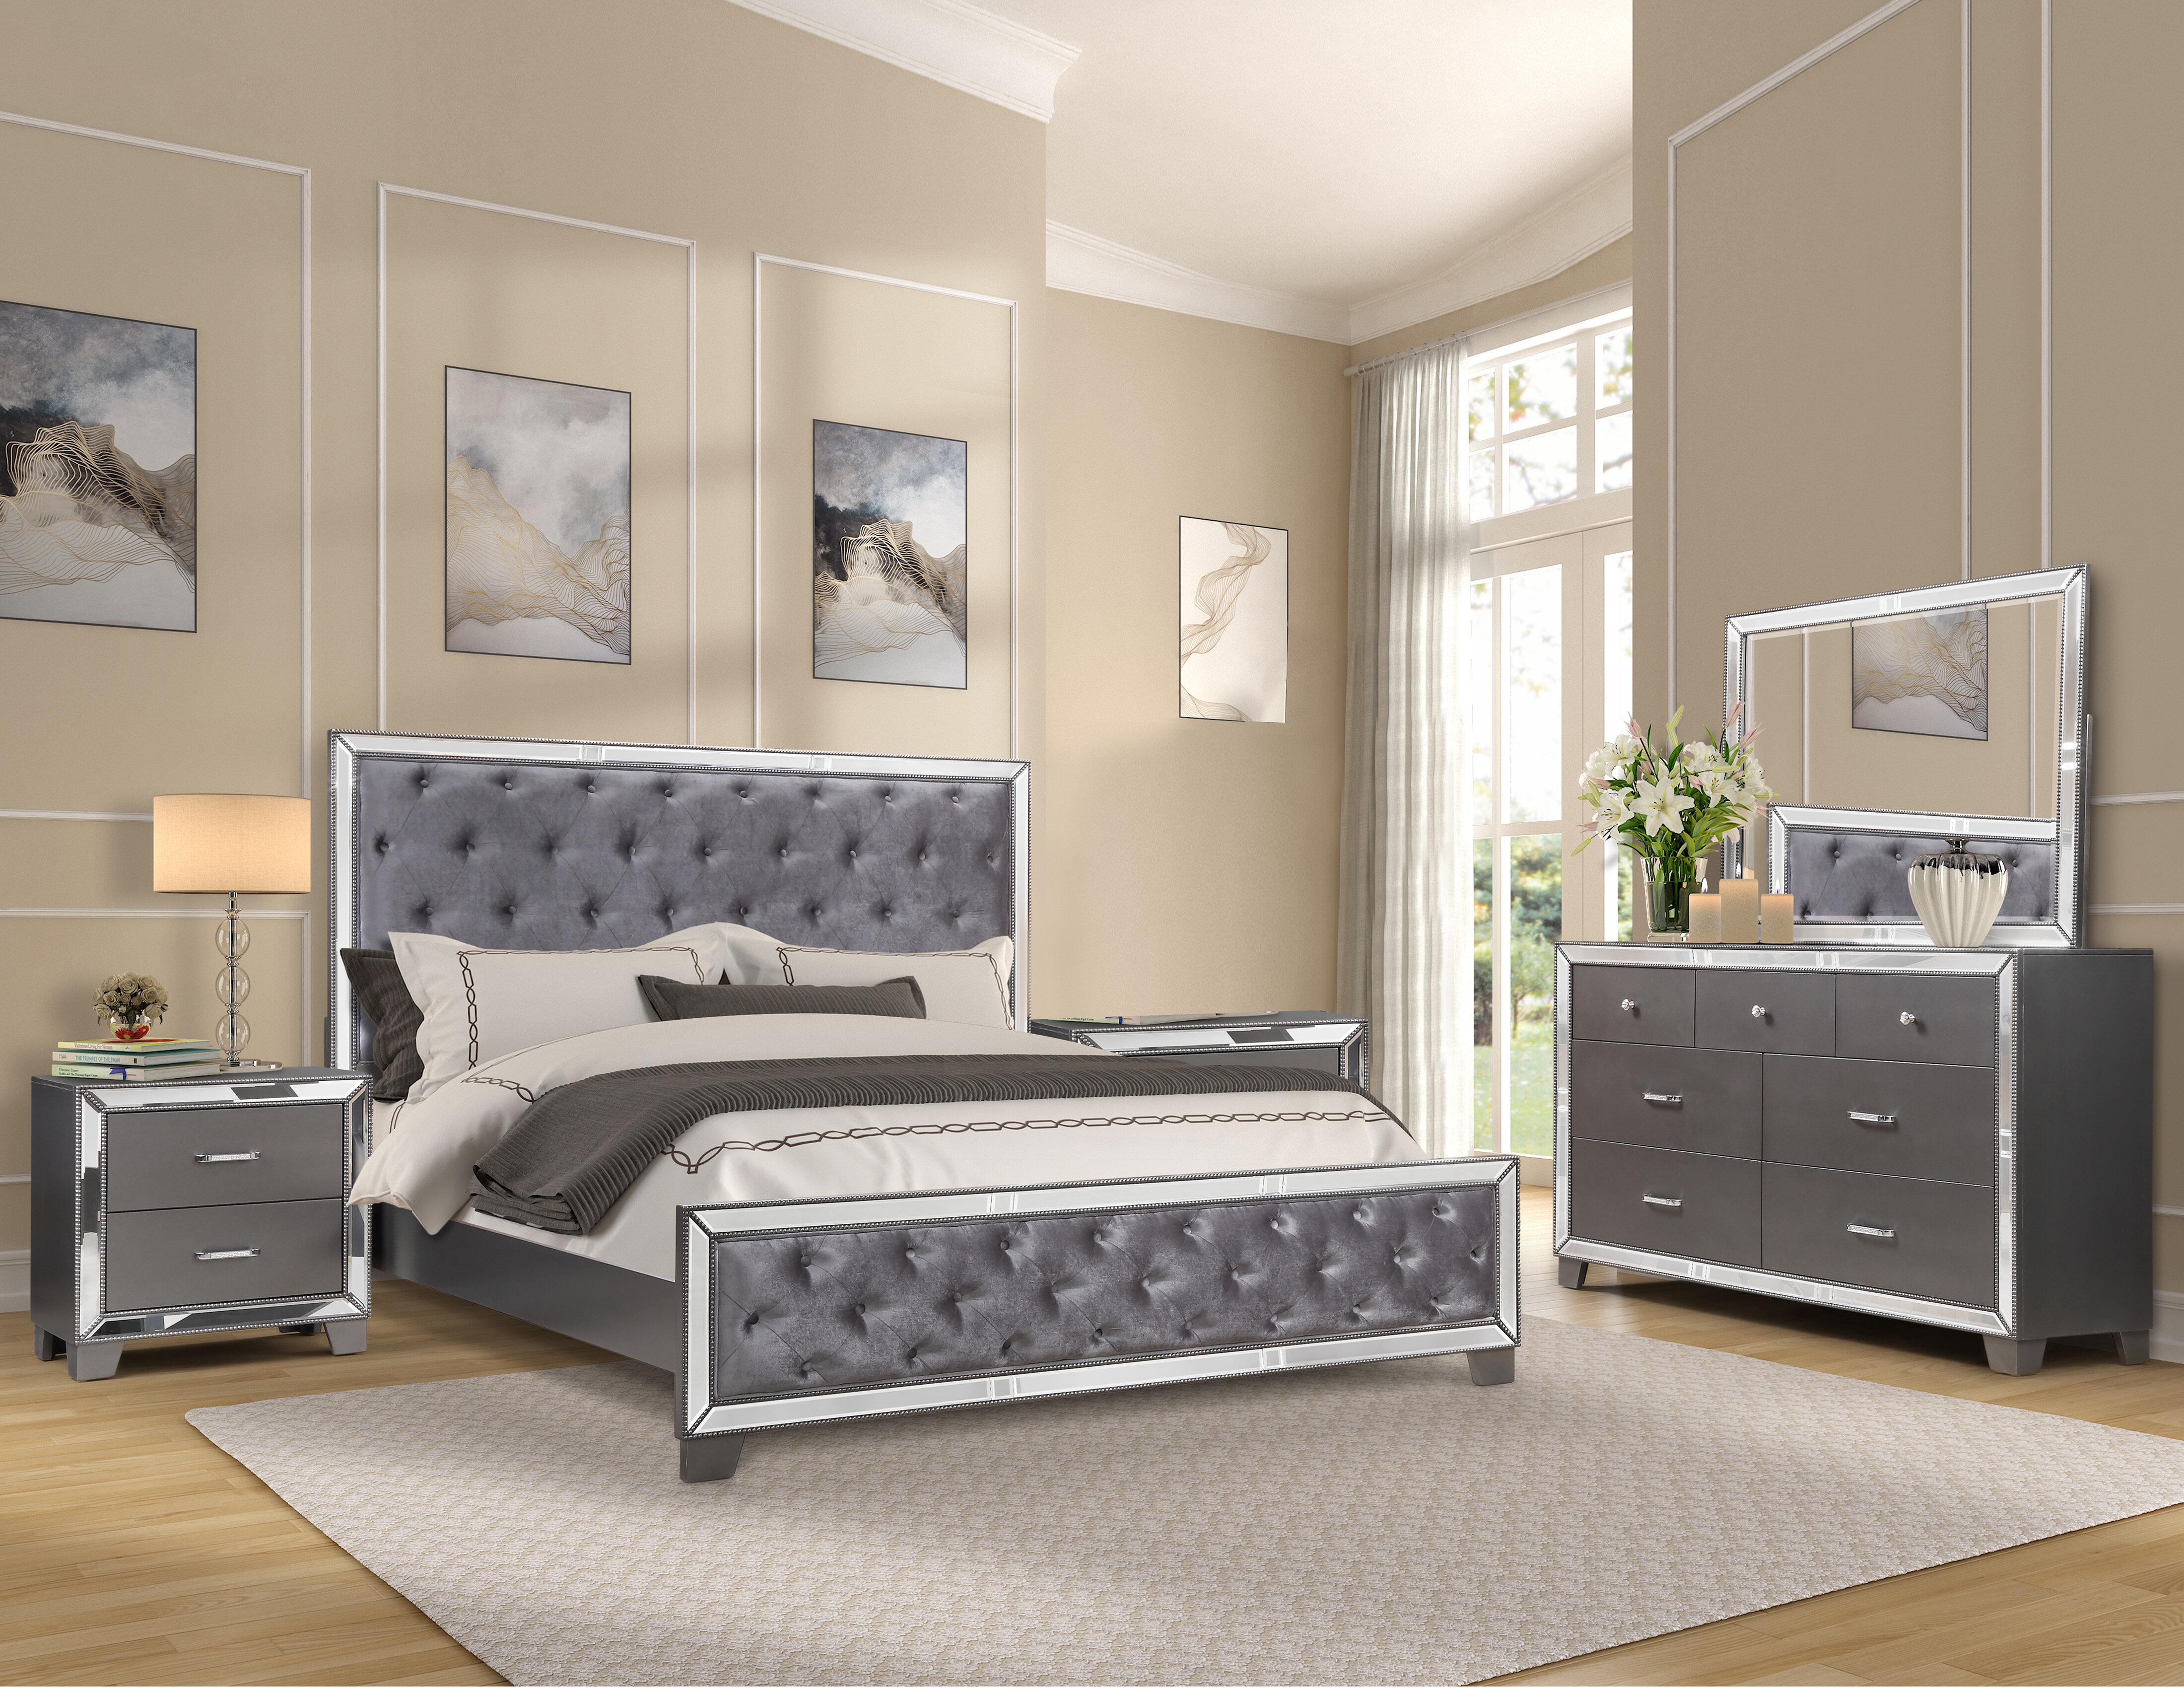 Bedroom Sets You Ll Love In 2021 Wayfair